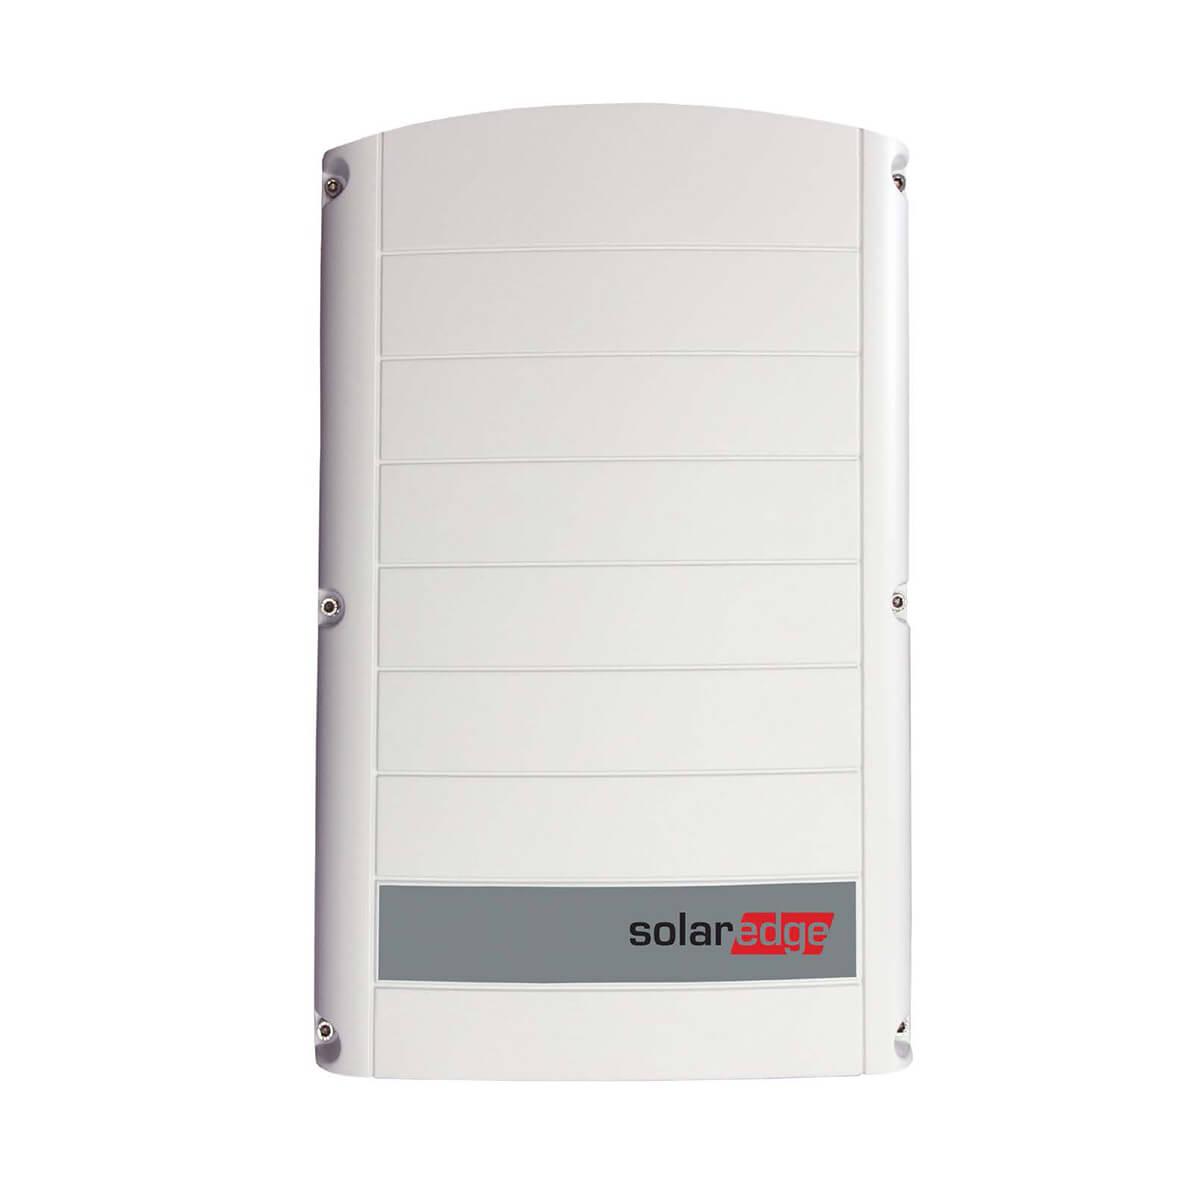 solaredge 5kW inverter, solaredge se5k 5kW inverter, solaredge se5k inverter, solaredge se5k, solaredge 5 kW